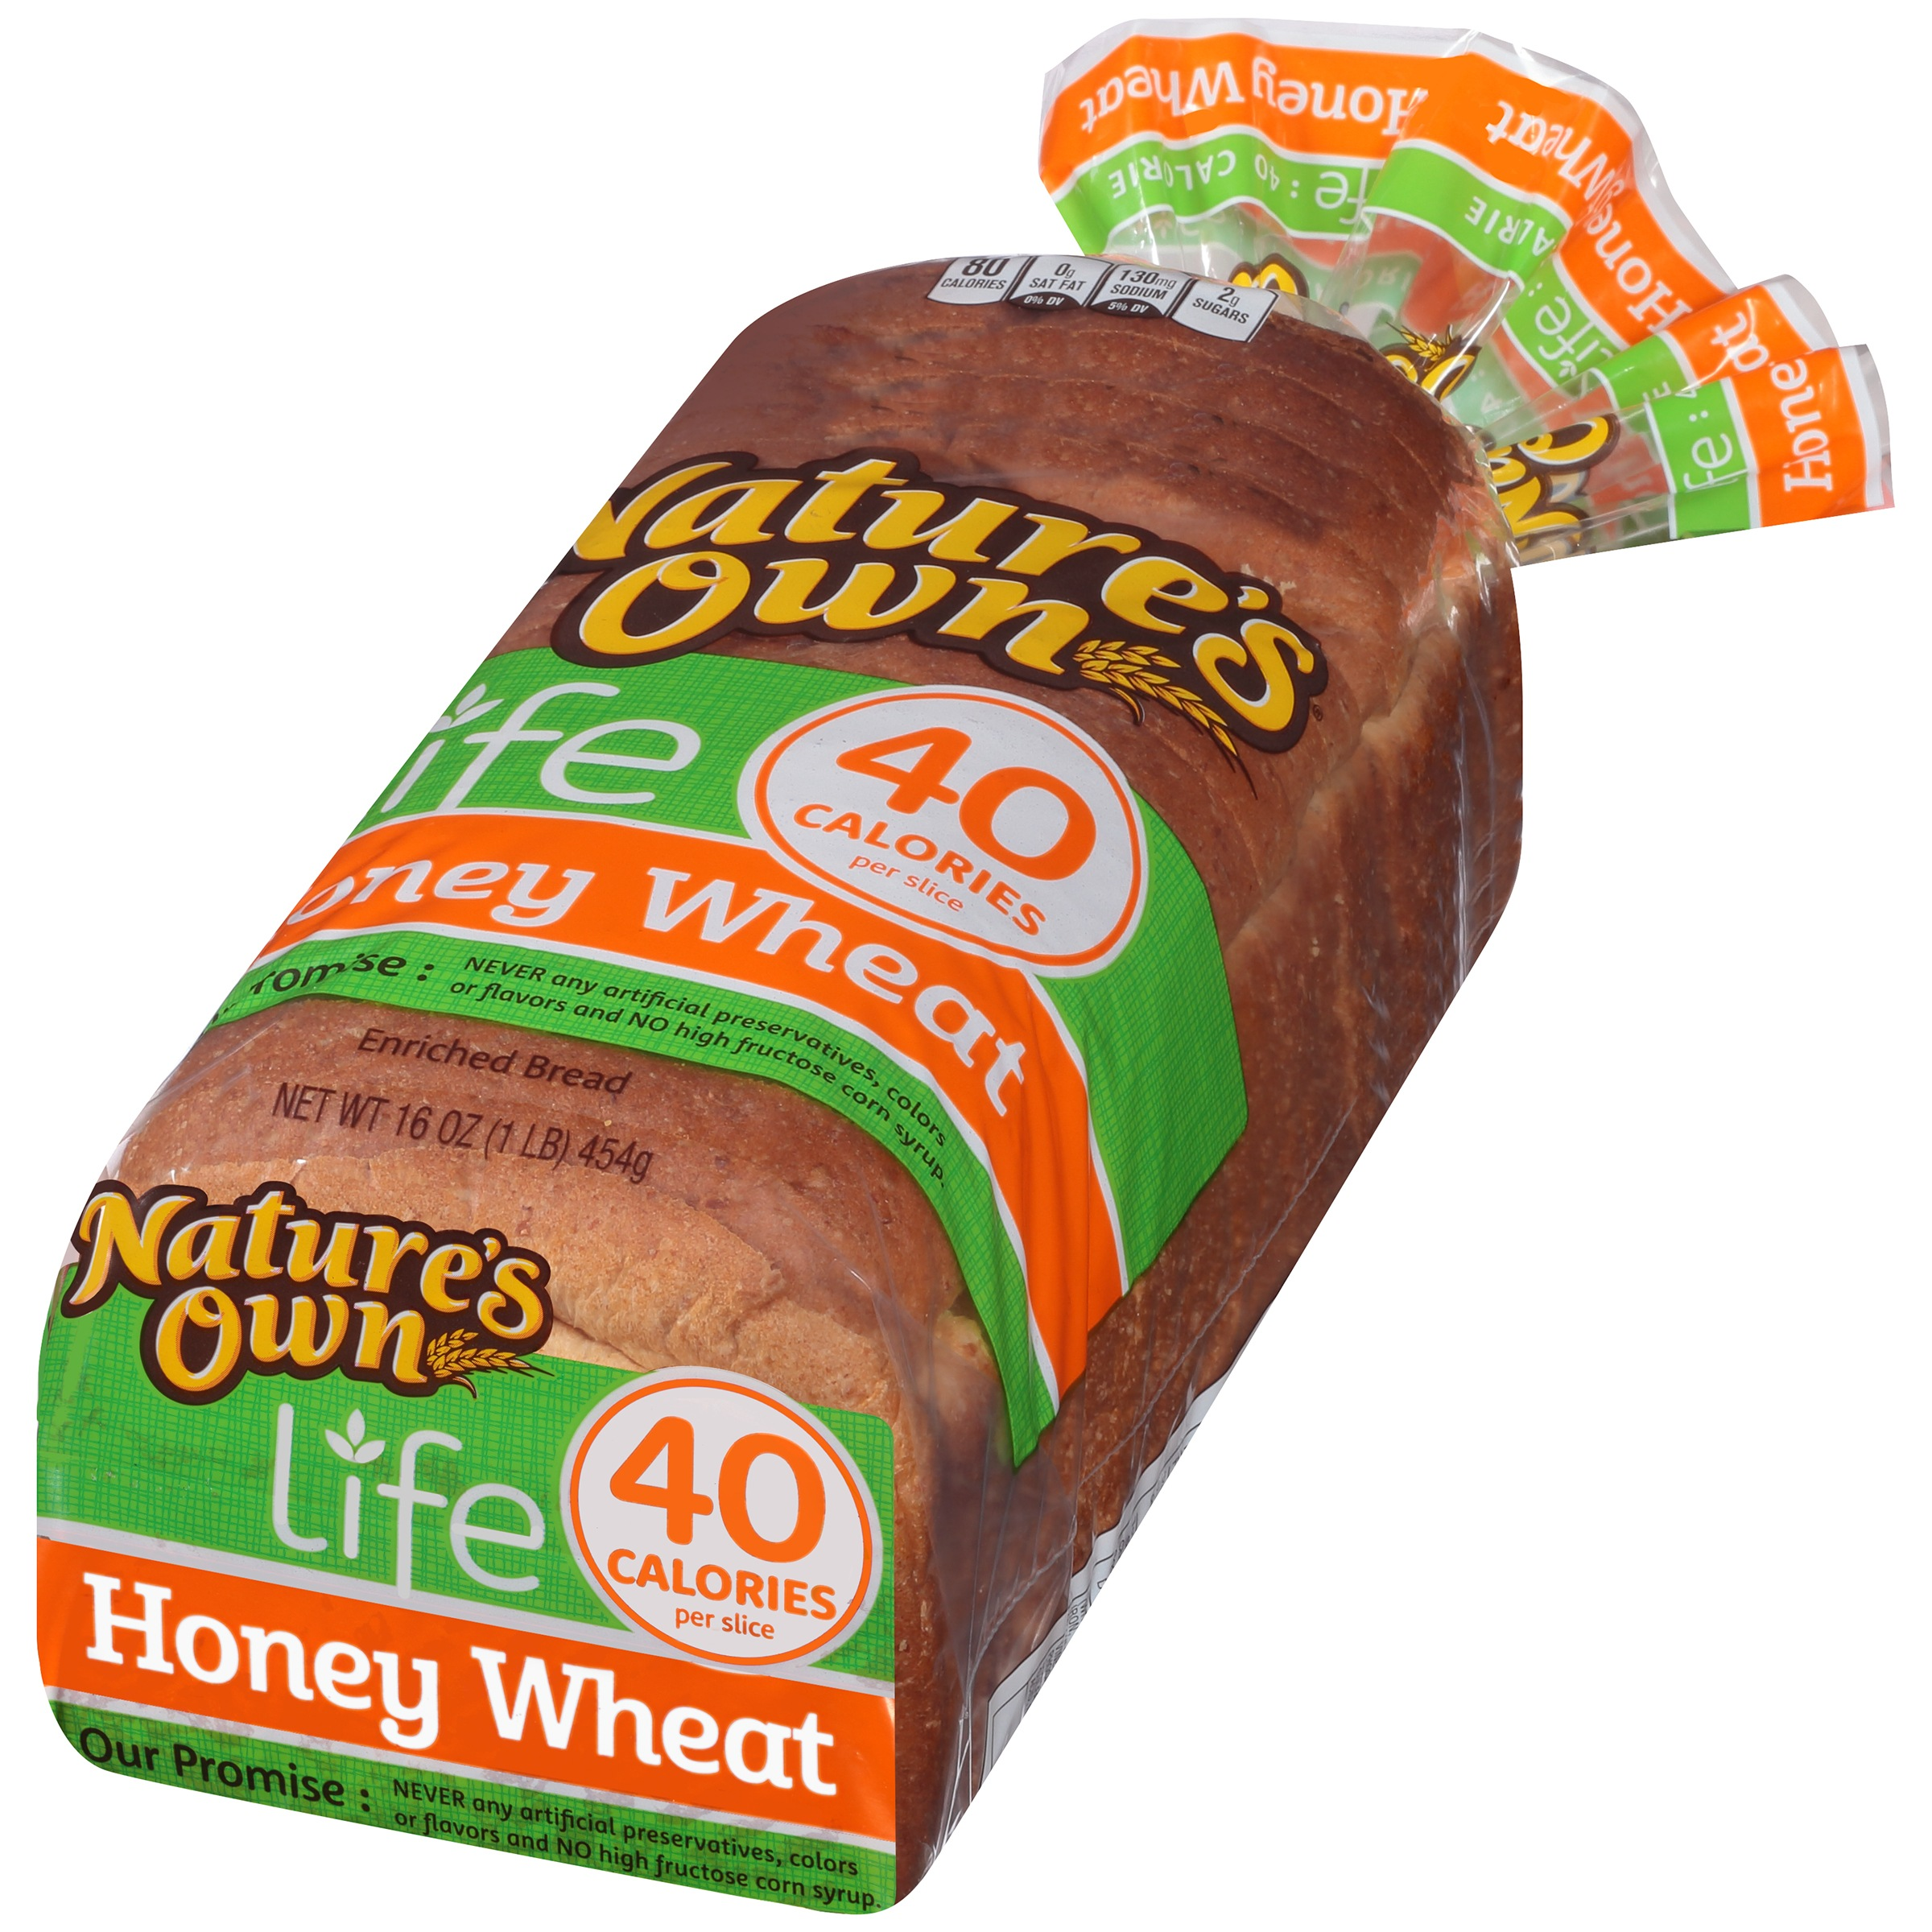 Nature's Own Life 40 Calories Honey Wheat Bread, 16 oz